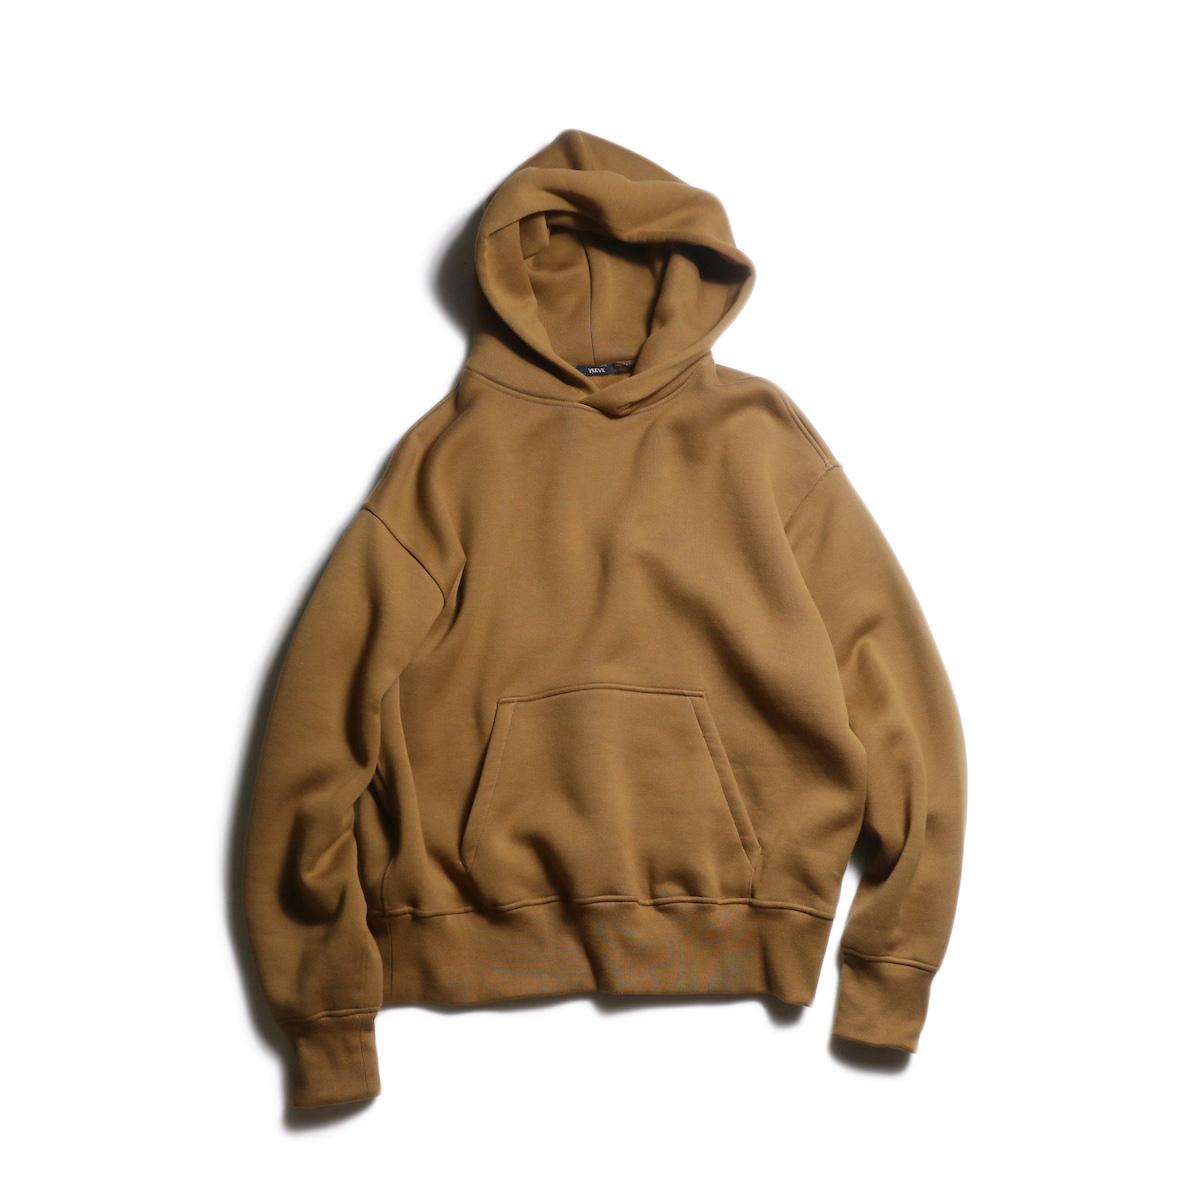 YLEVE / Fine Cotton Fleece Hoodie (Camel)